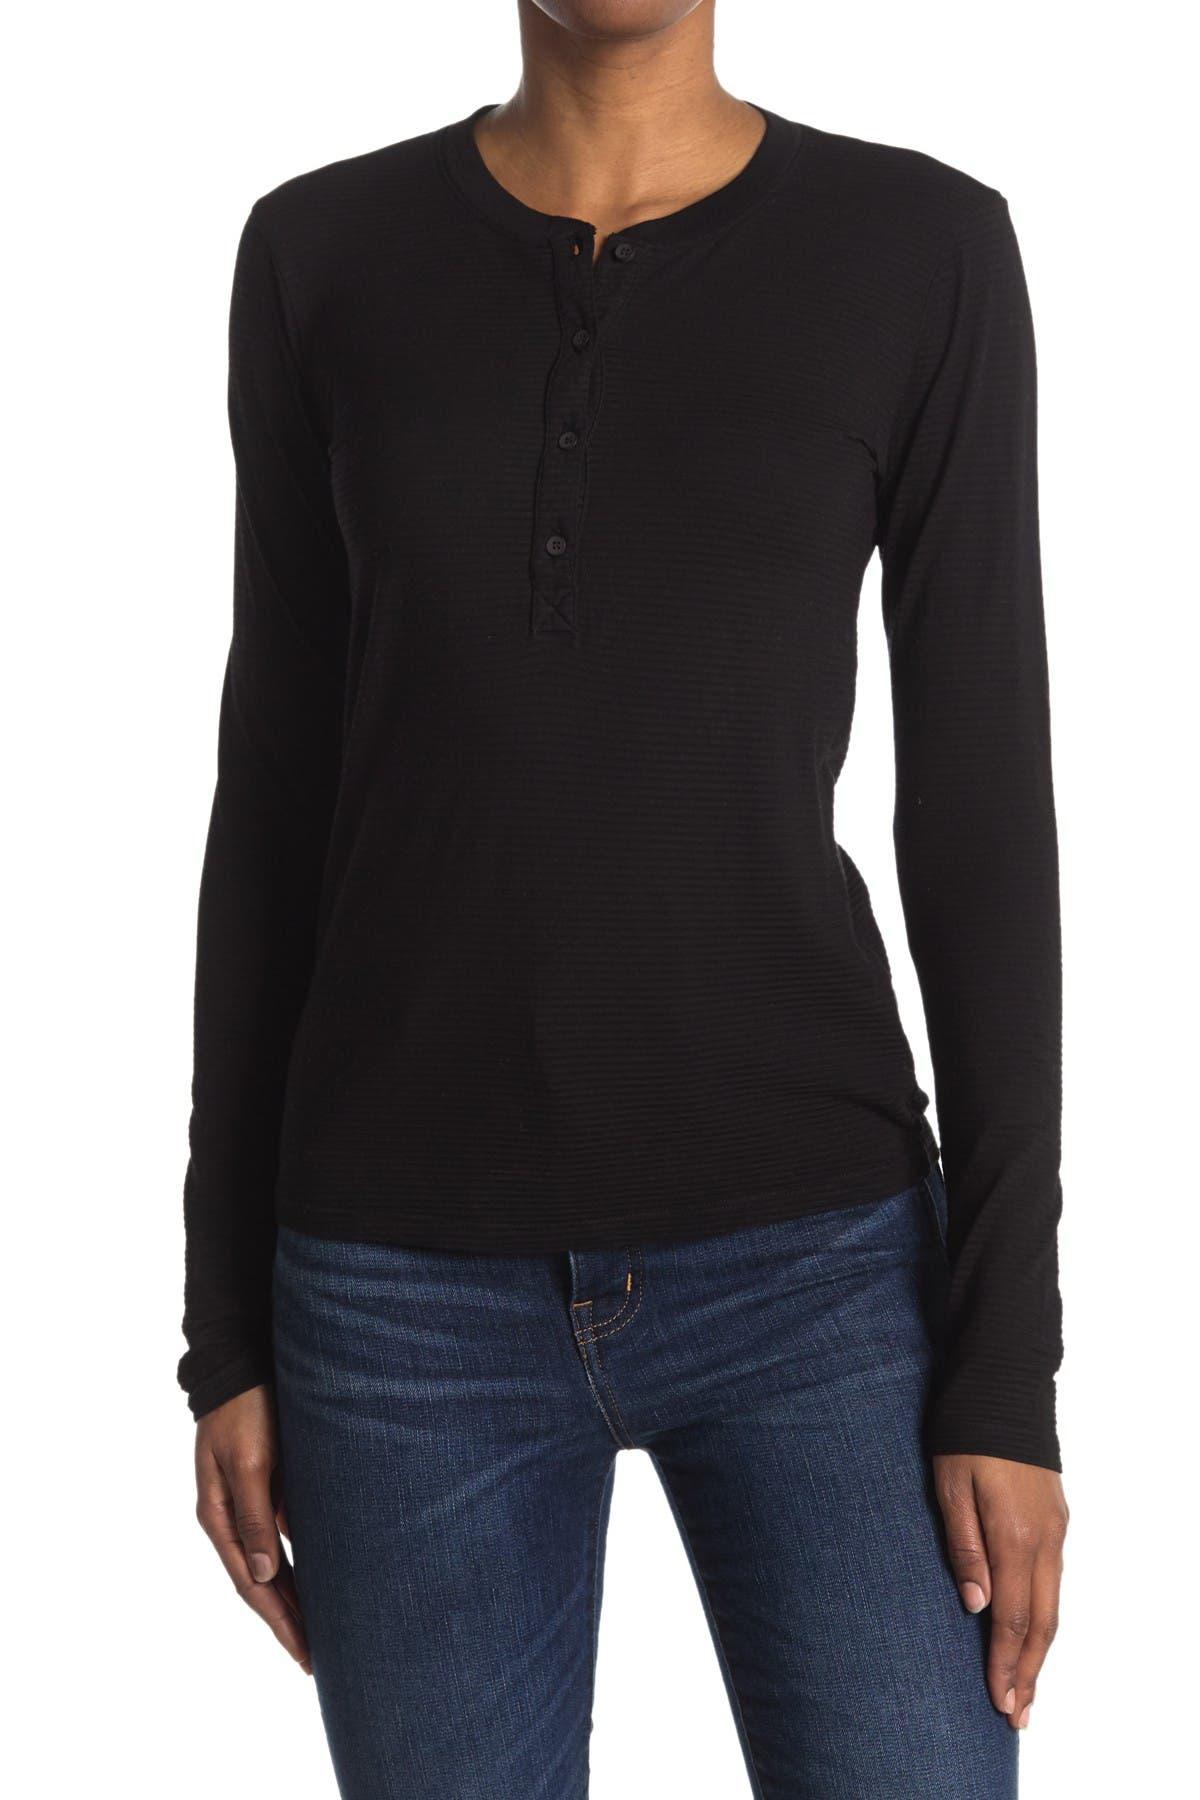 Image of Stateside Shadow Stripe Jersey Long Sleeve Henley